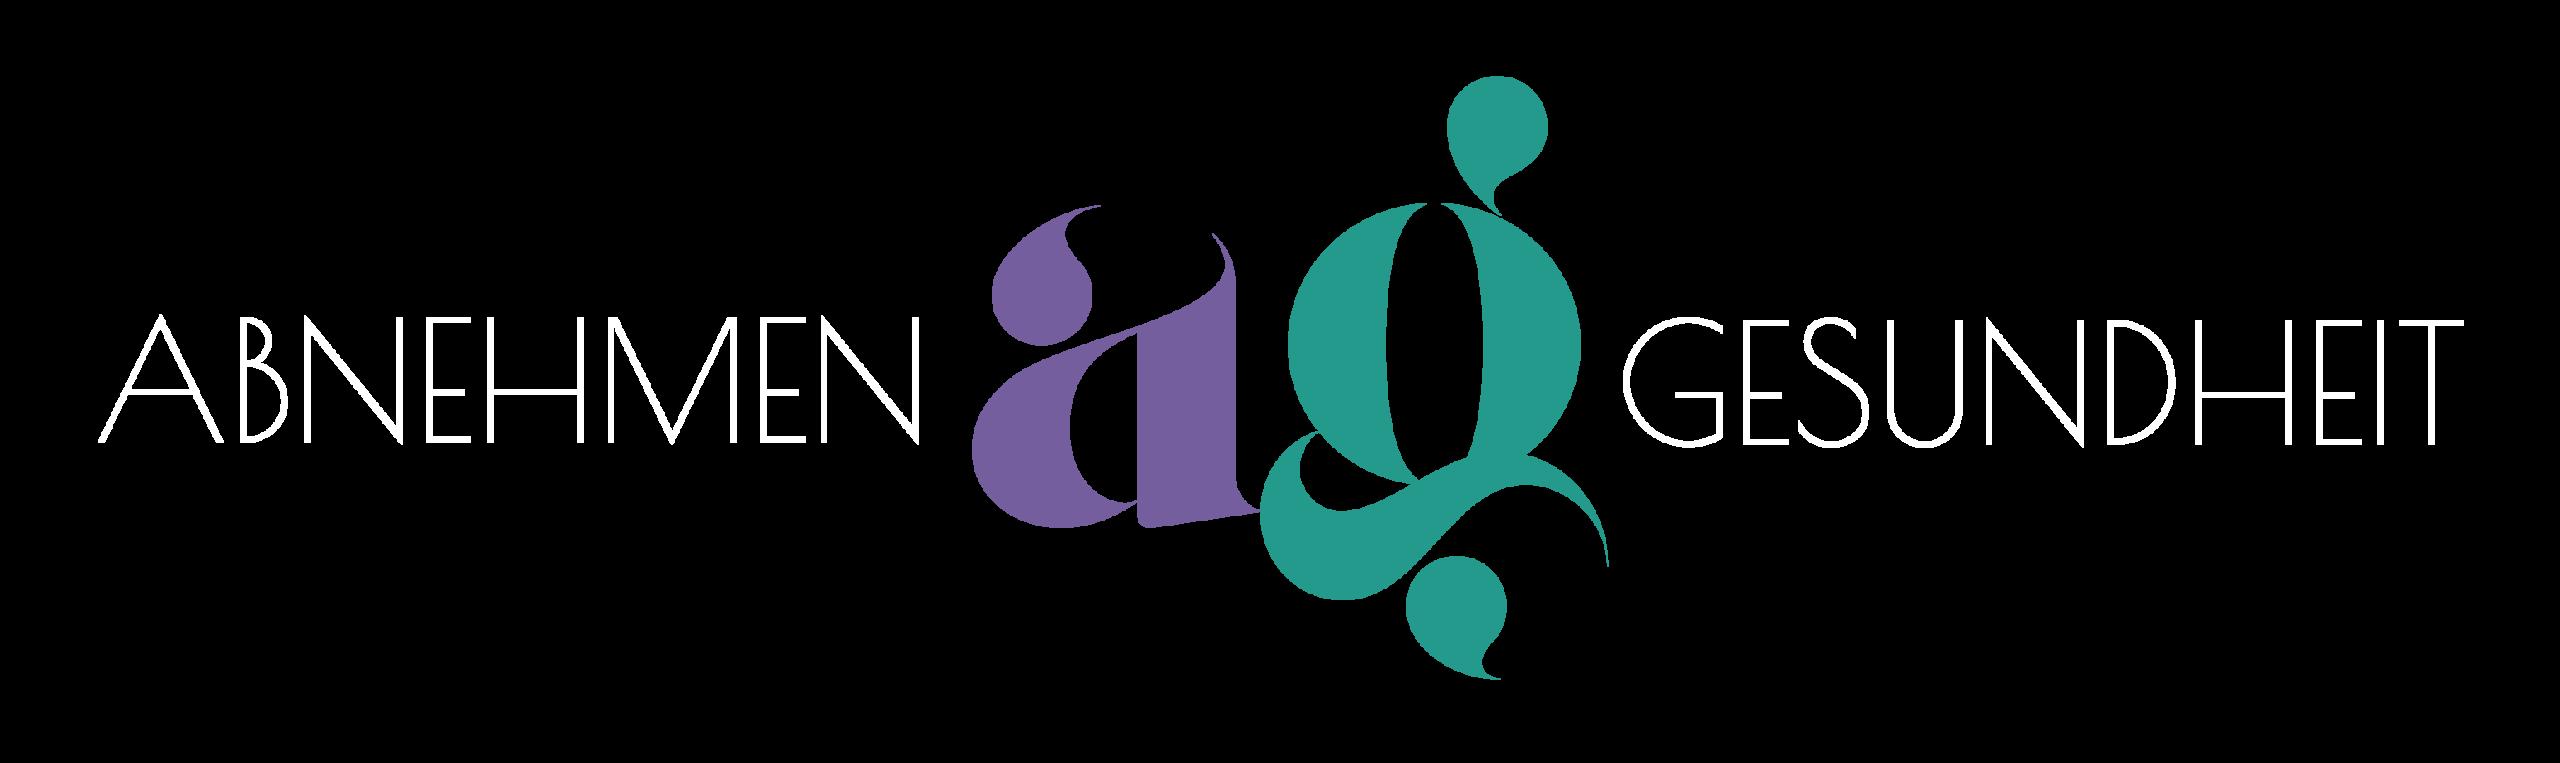 Abnehmen Gesundheit Semea Mind Logo